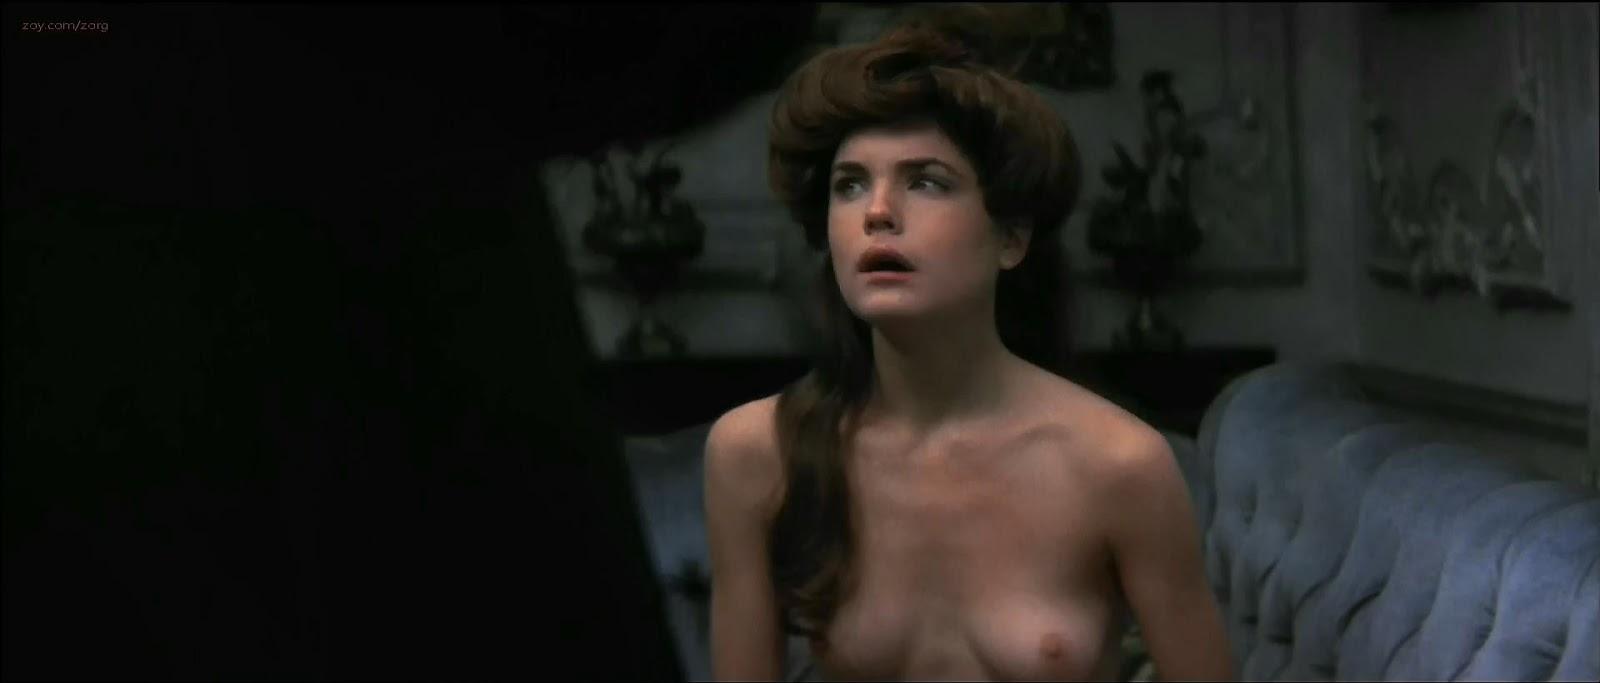 Elizabeth berridge nude, topless and sexy